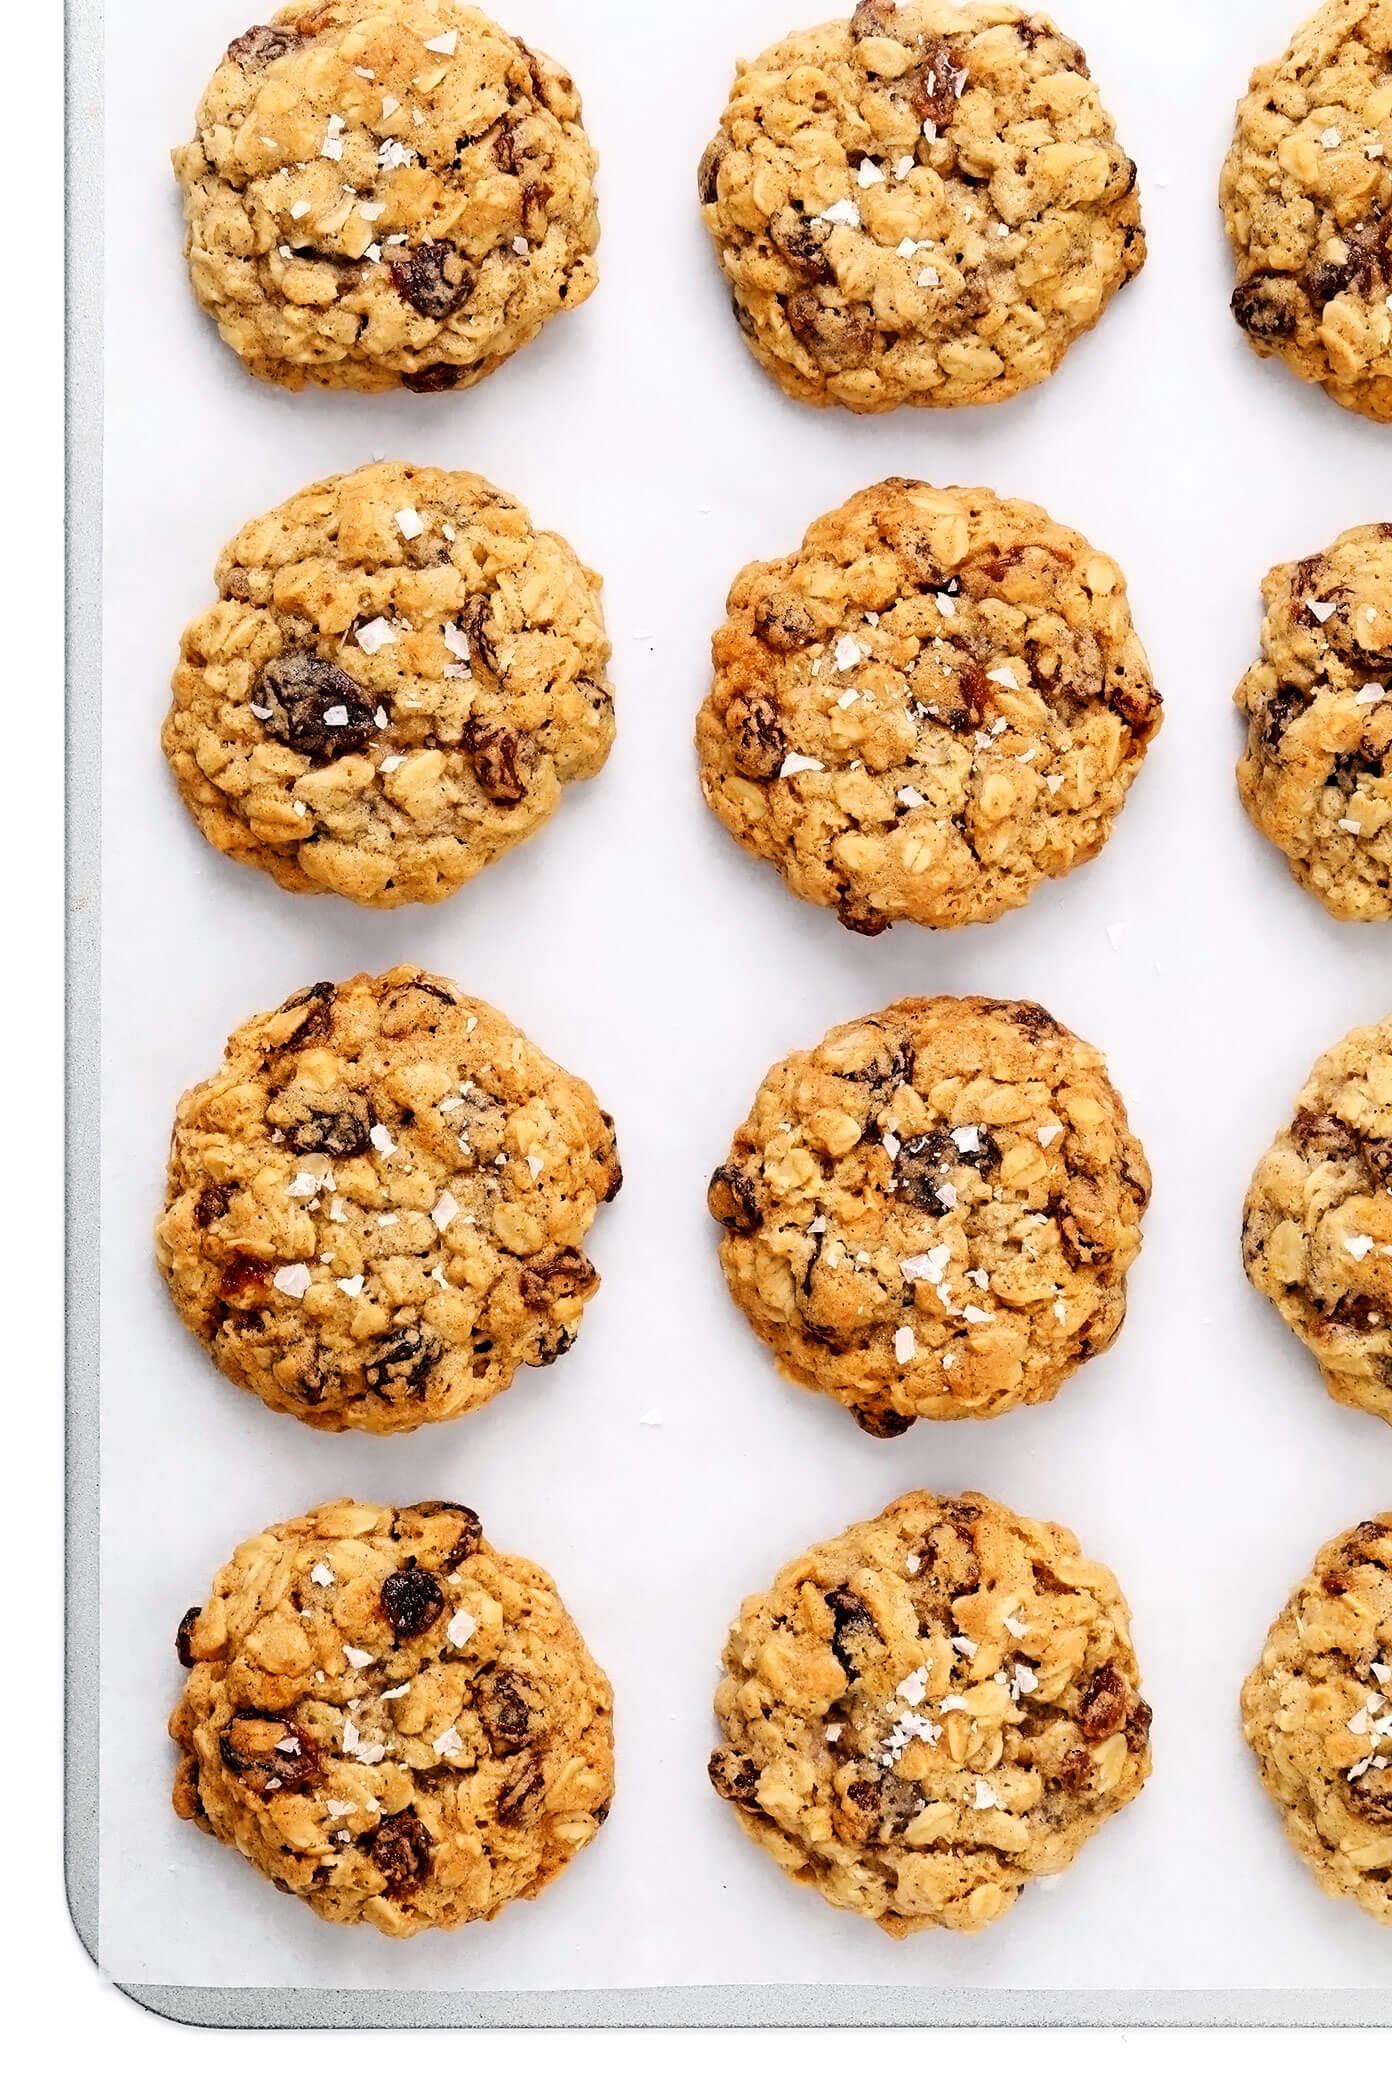 Oatmeal Cookies on Sheet Pan